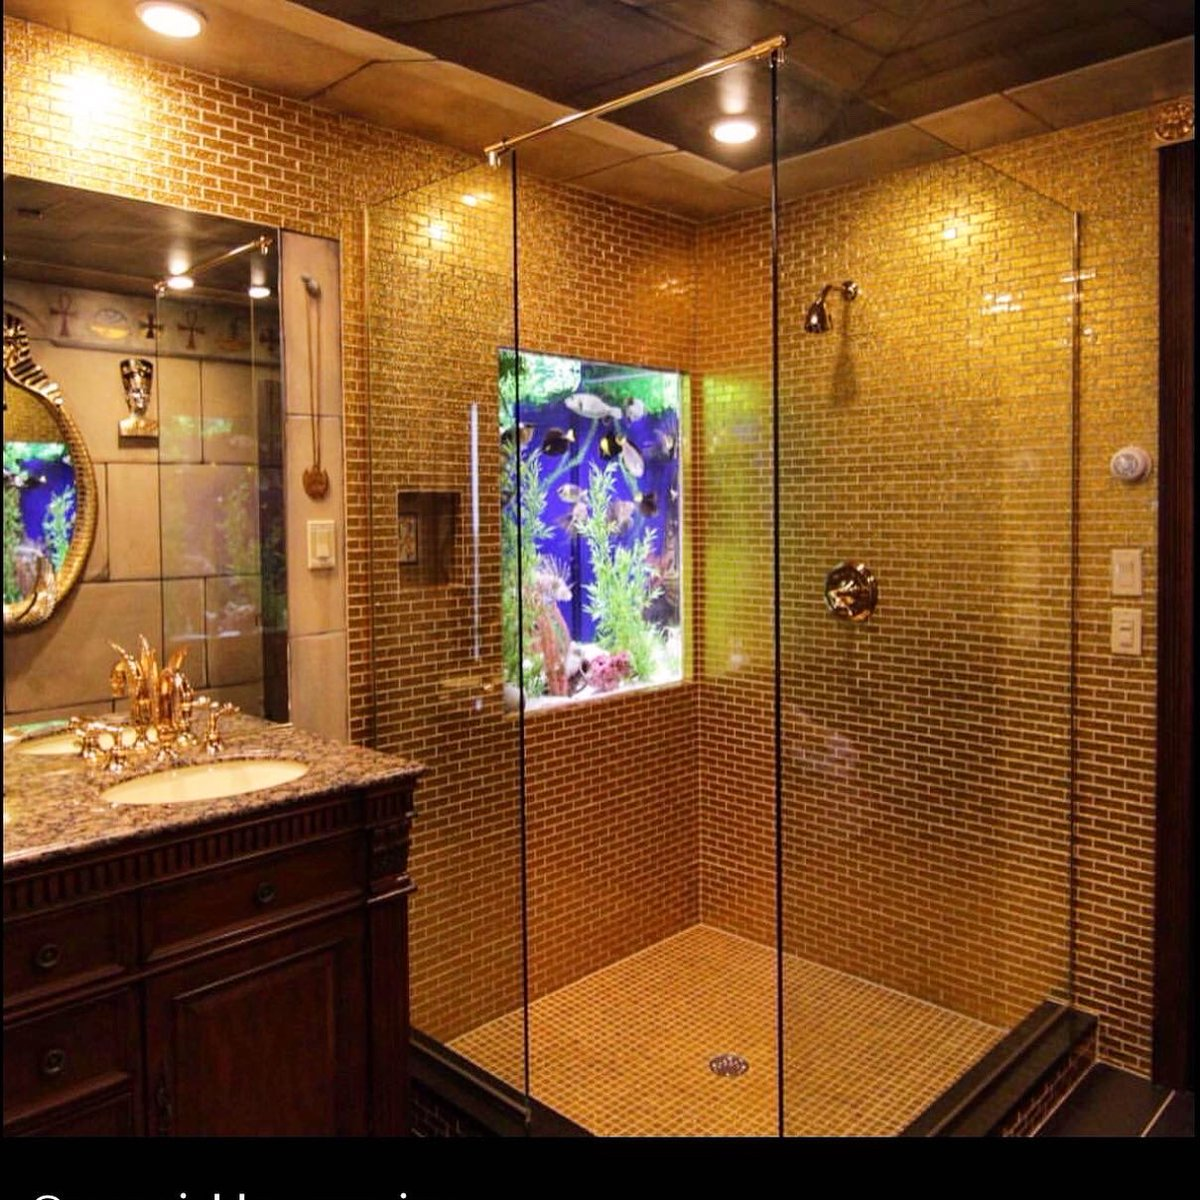 If you're going to install a fish tank in your #shower, you might as well surround it with Gold Glitter Glass #Tiles ✨  https://t.co/6yccBNRYRr #bathroomremodel #subwaytiles #glasstiles #backsplash #golddecor #designinspo #homedecor #bathroomdecor #designideas #interiordesign https://t.co/Olk2HUCFJp